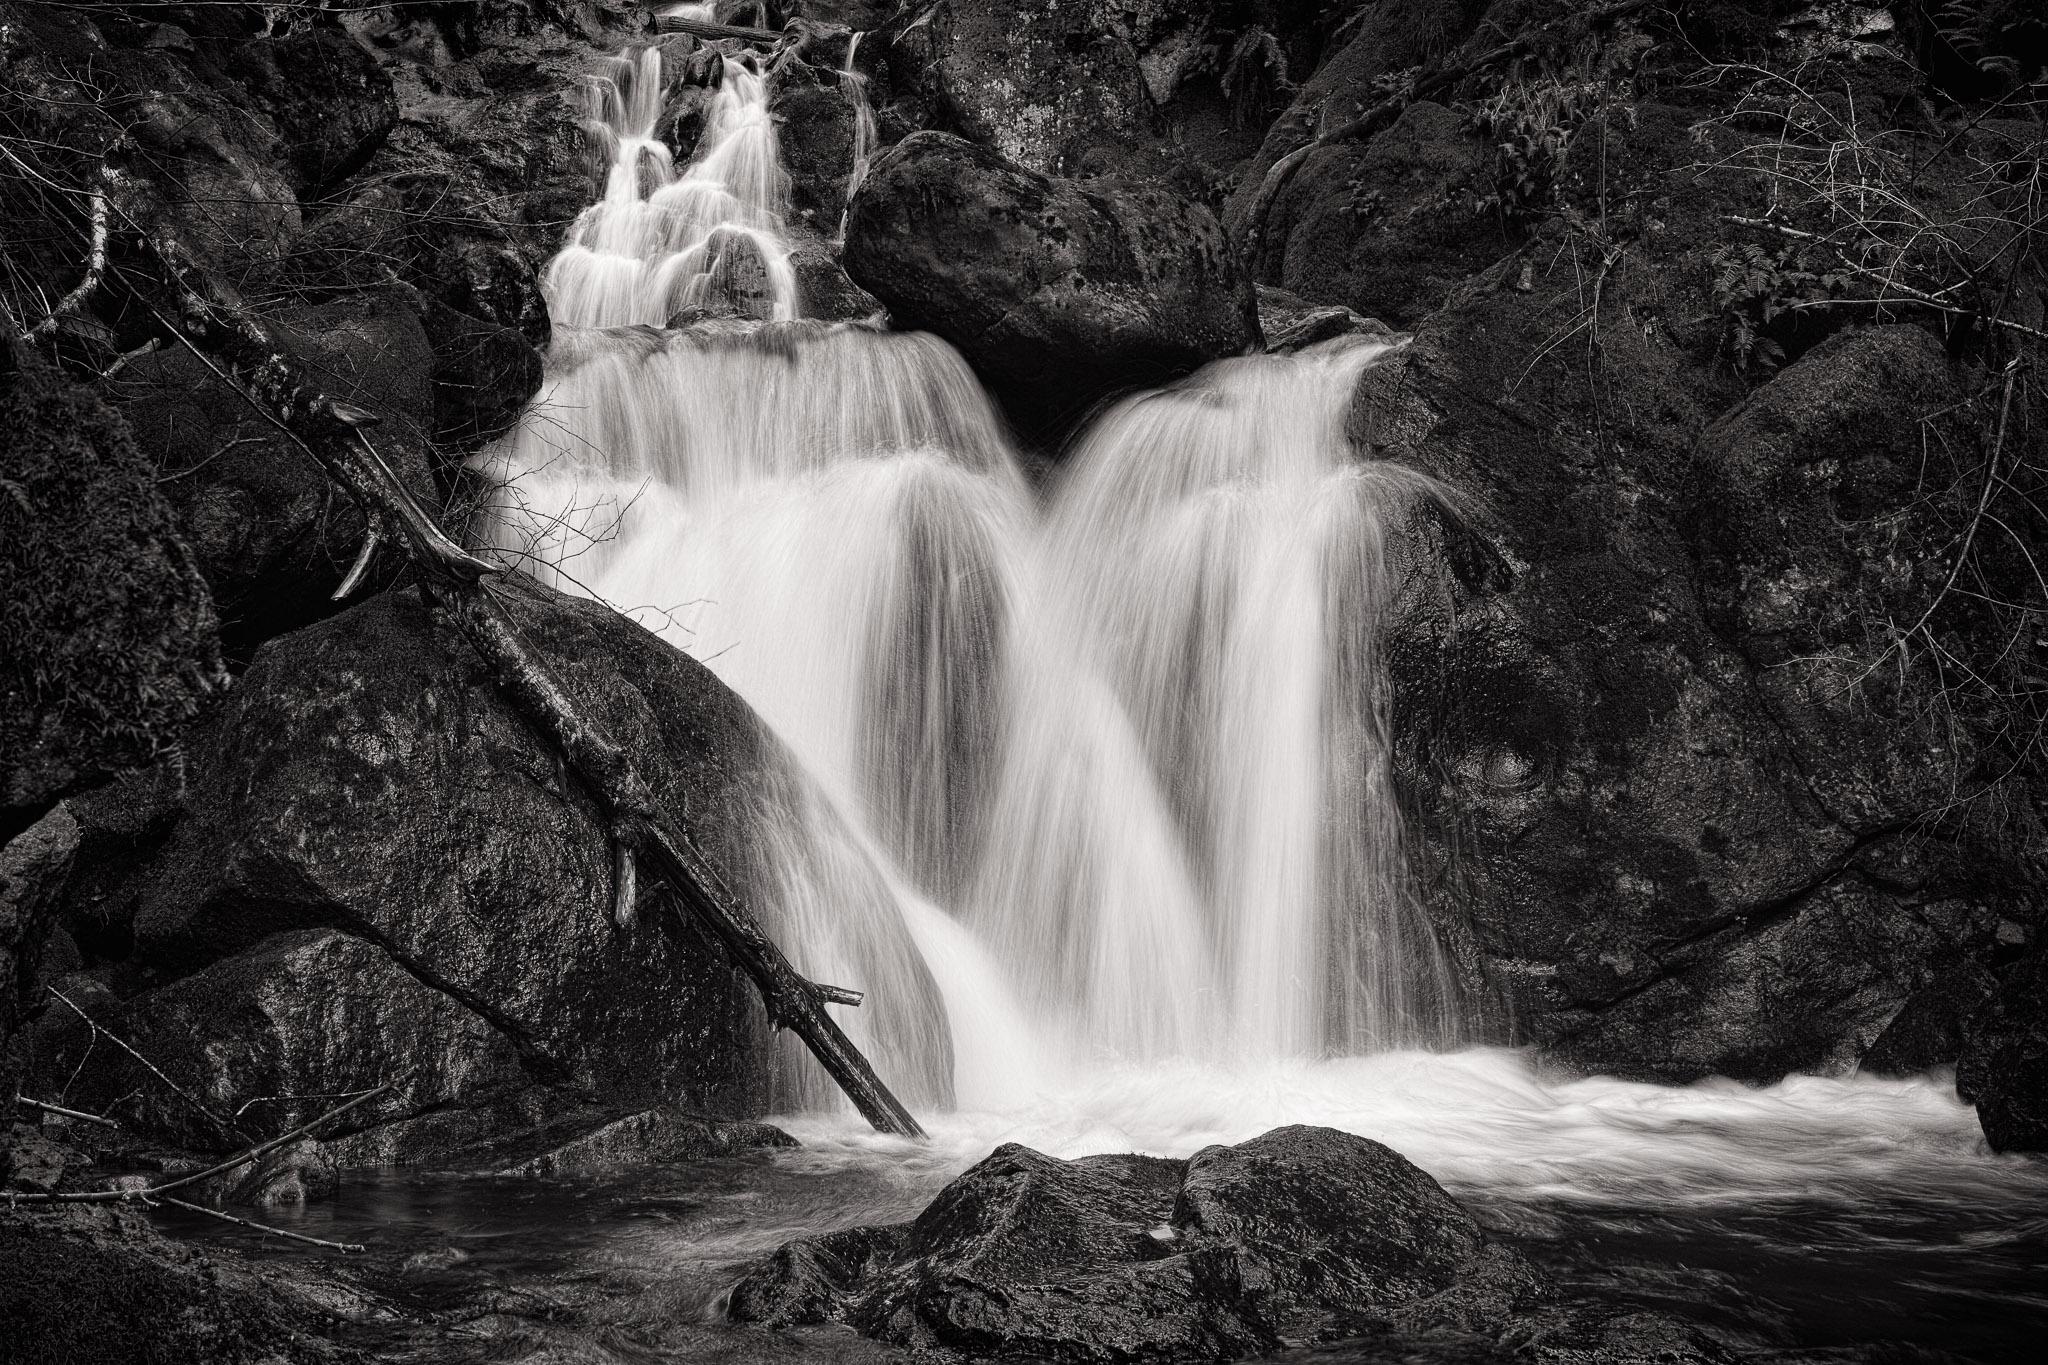 Lower Rodney Falls